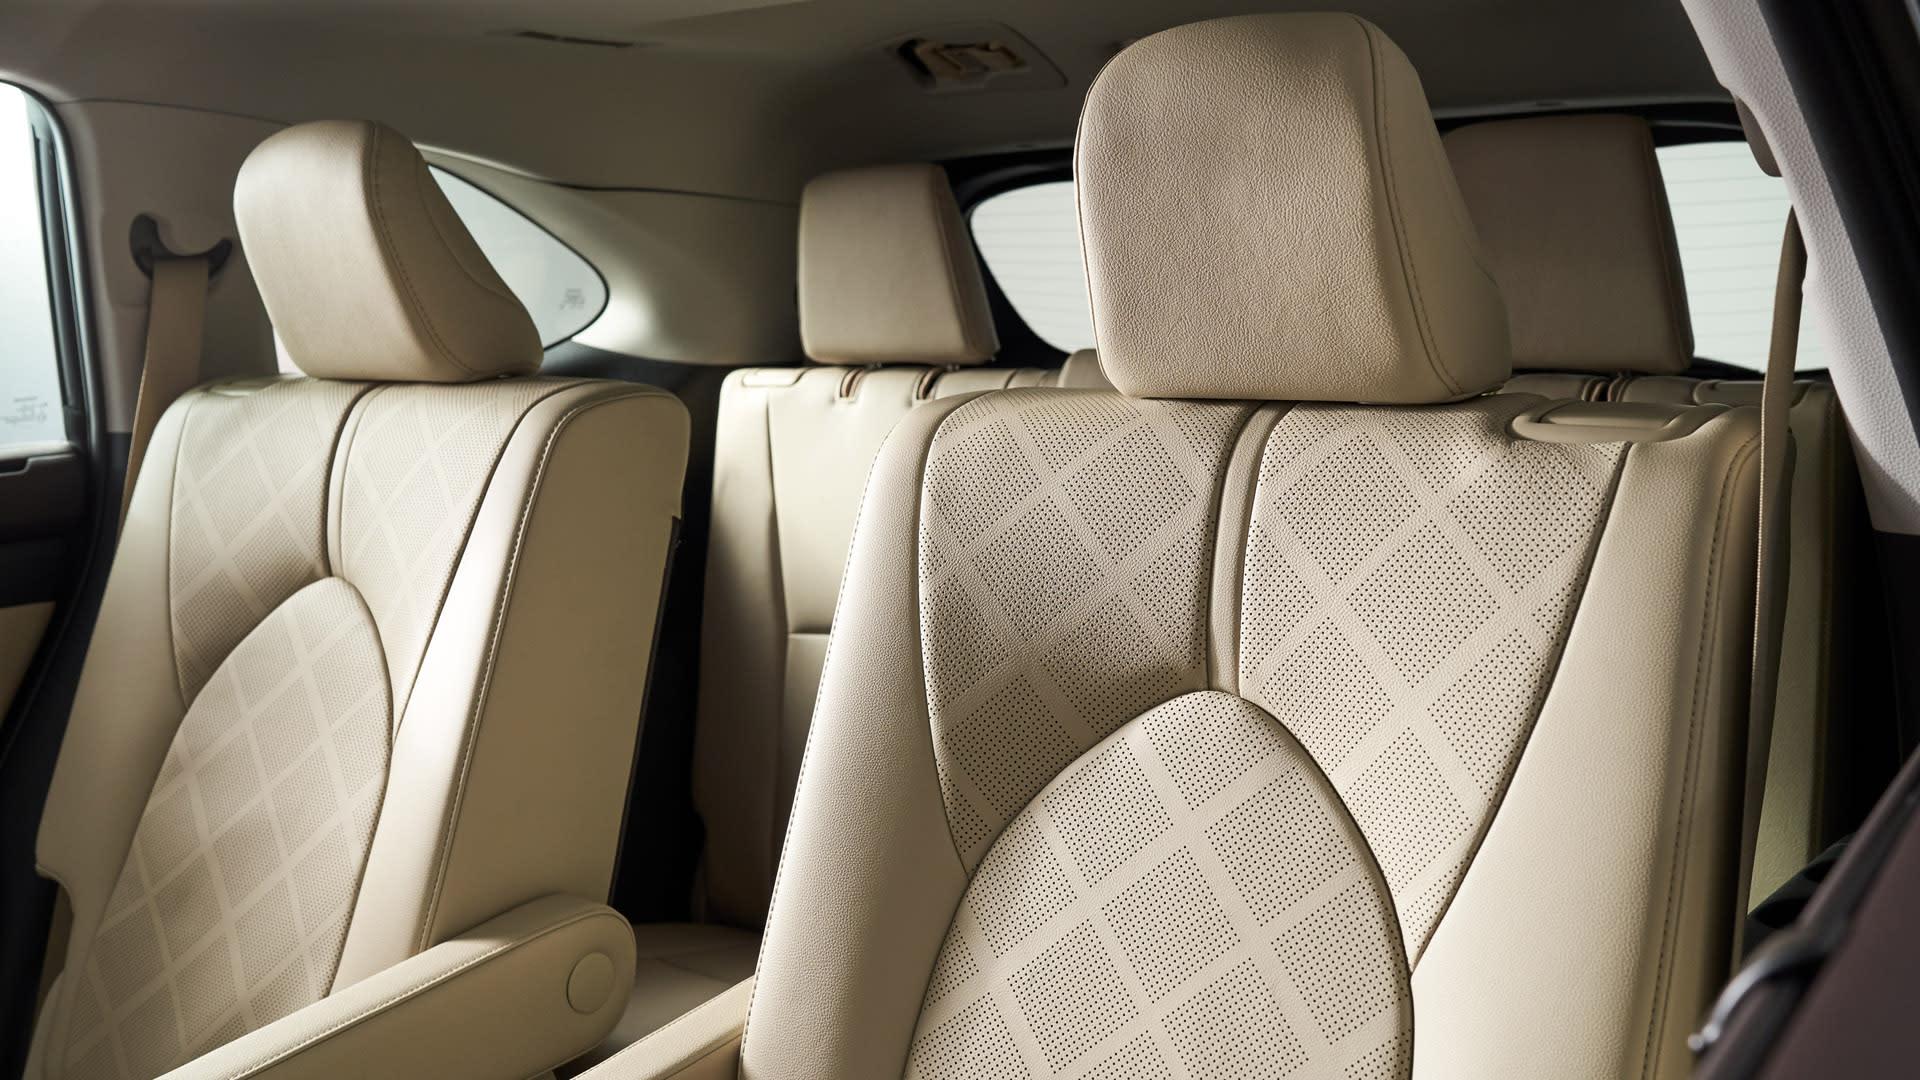 Toyota Highlander Seating >> 2020 Toyota Highlander Reviews Features Fuel Economy Interior